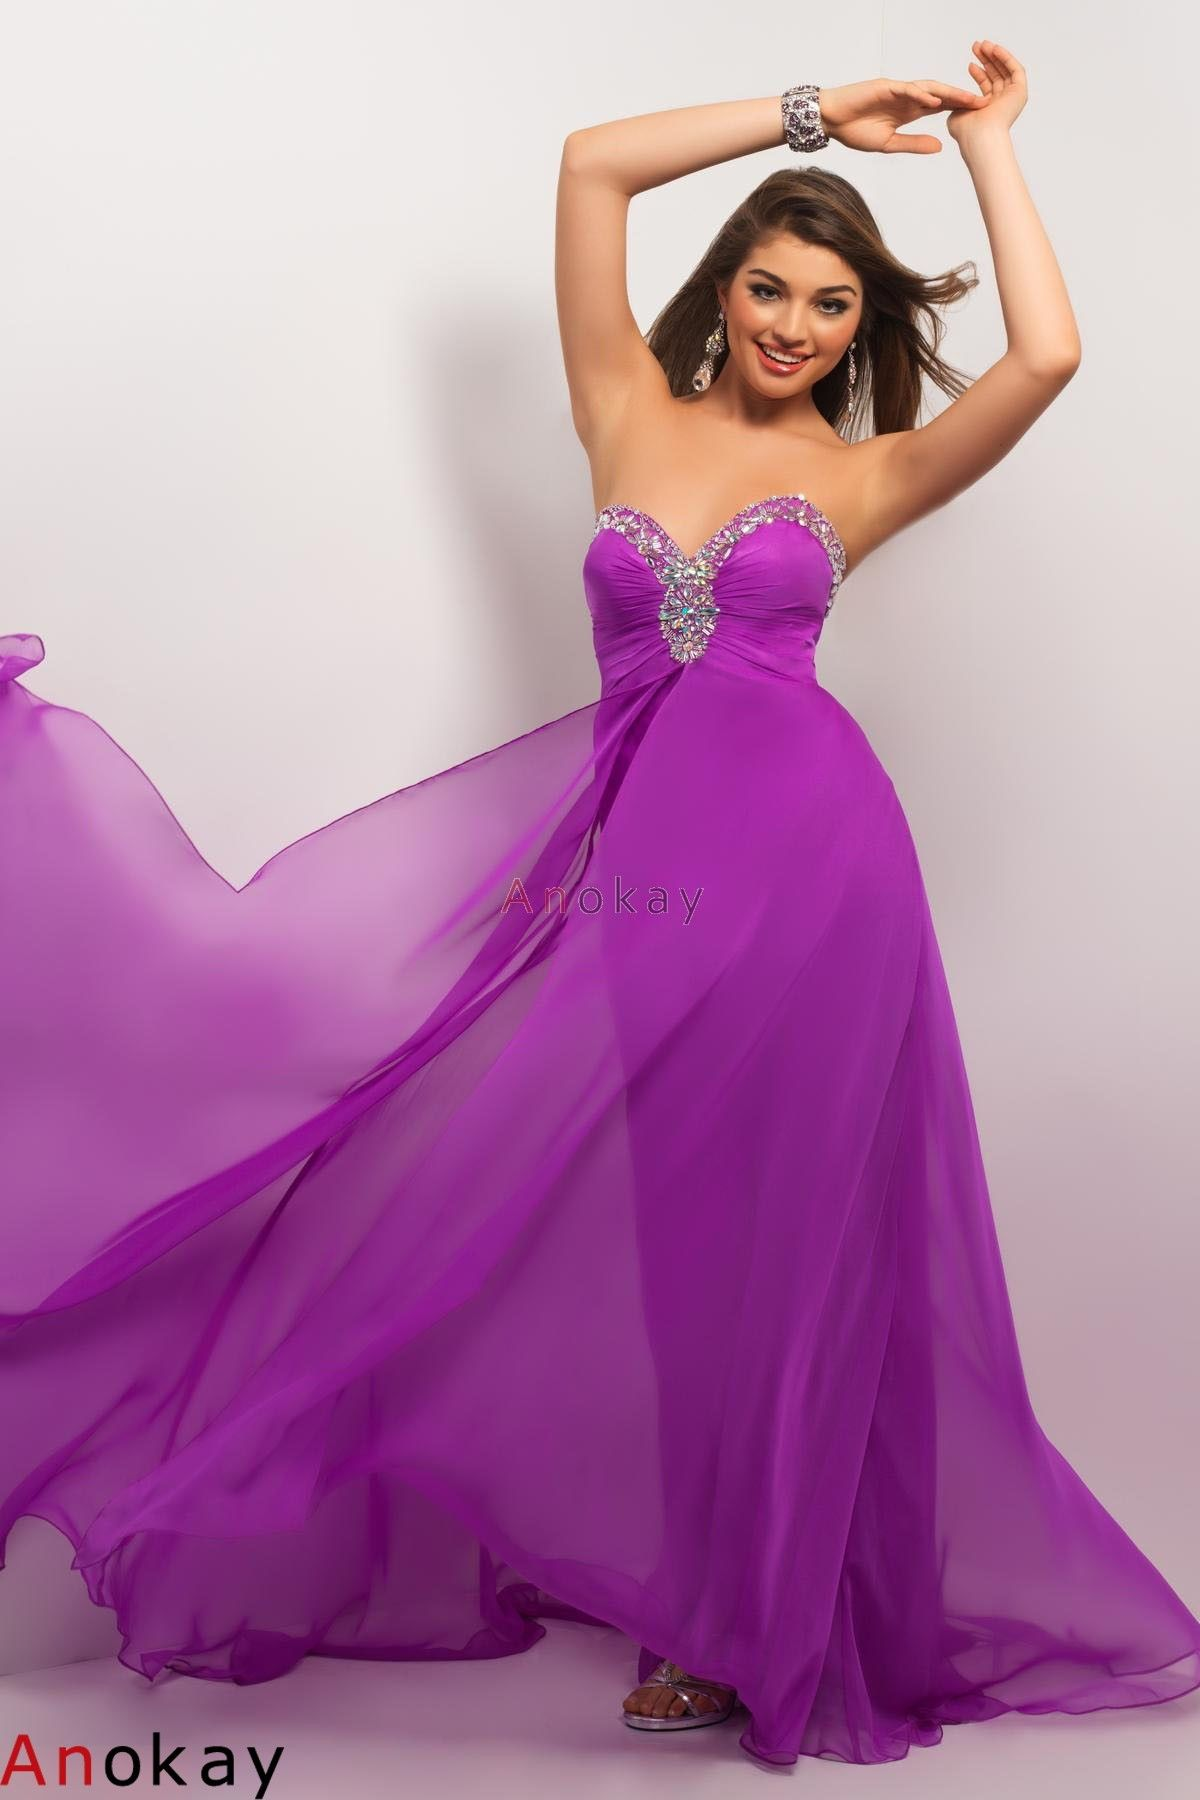 prom dress | •∂яєѕѕєѕ• | Pinterest